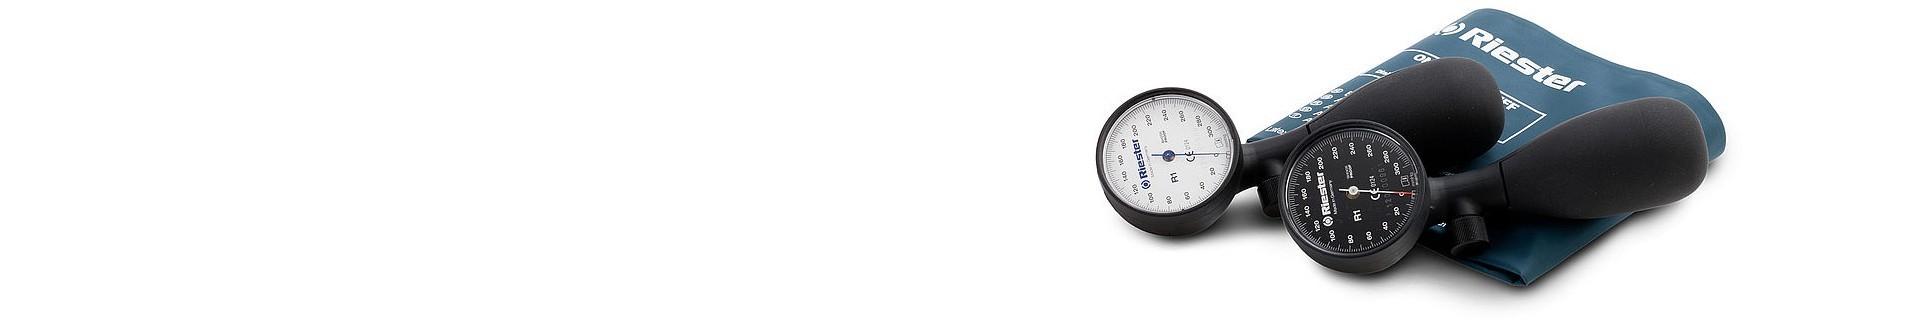 Tensiometre mecanice Riester